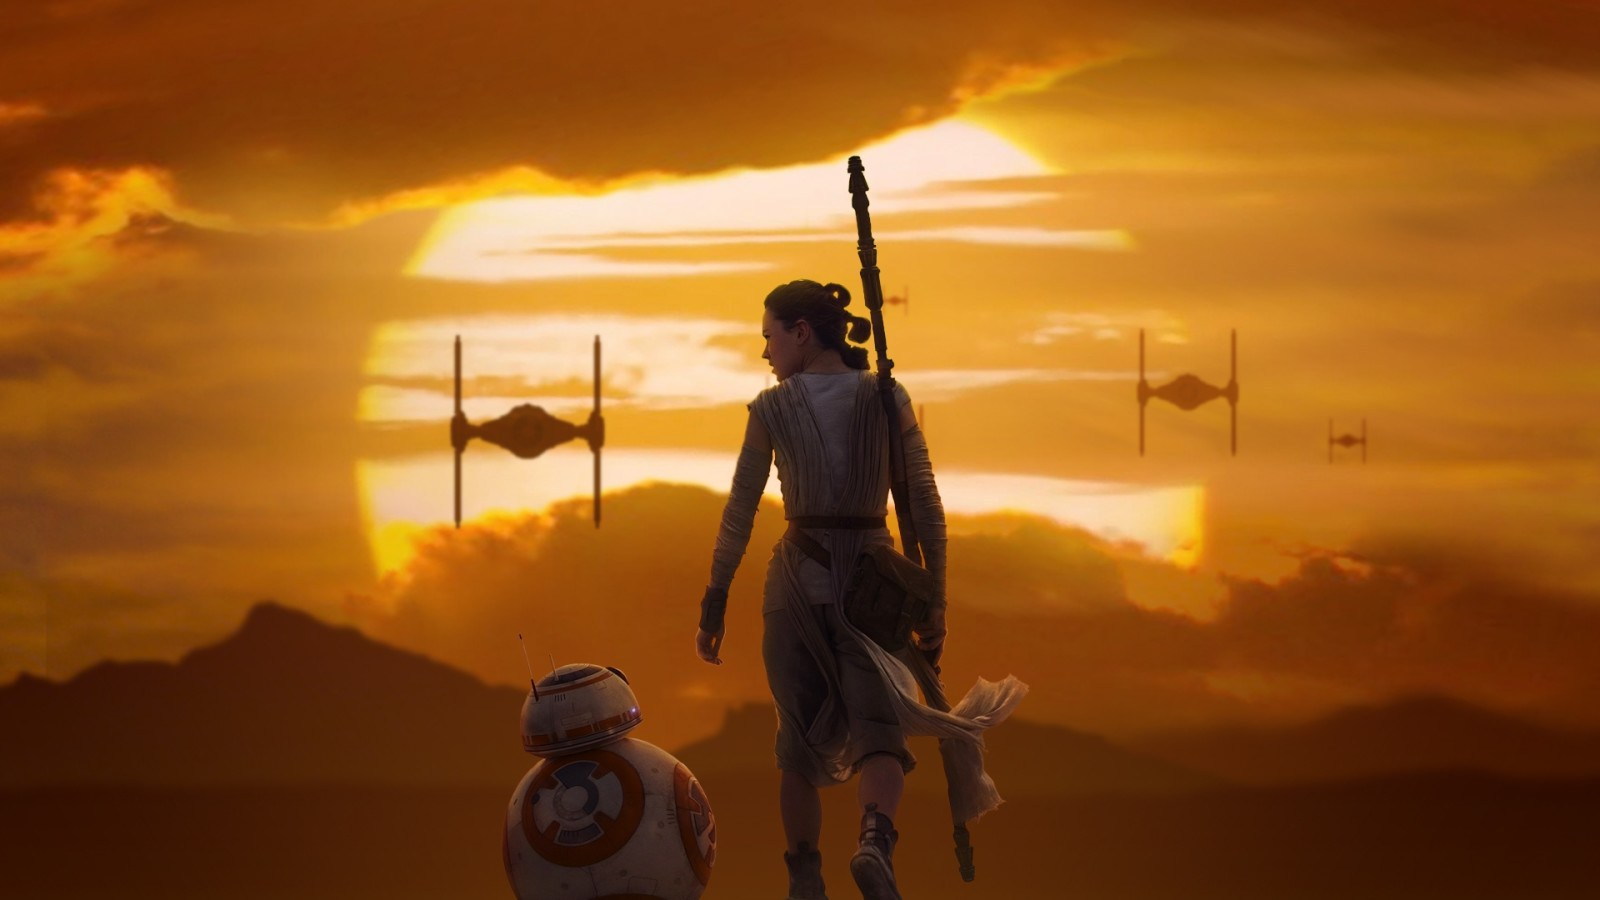 rey__bb_8_star_wars_the_force_awakens-HD-1600x900.jpg